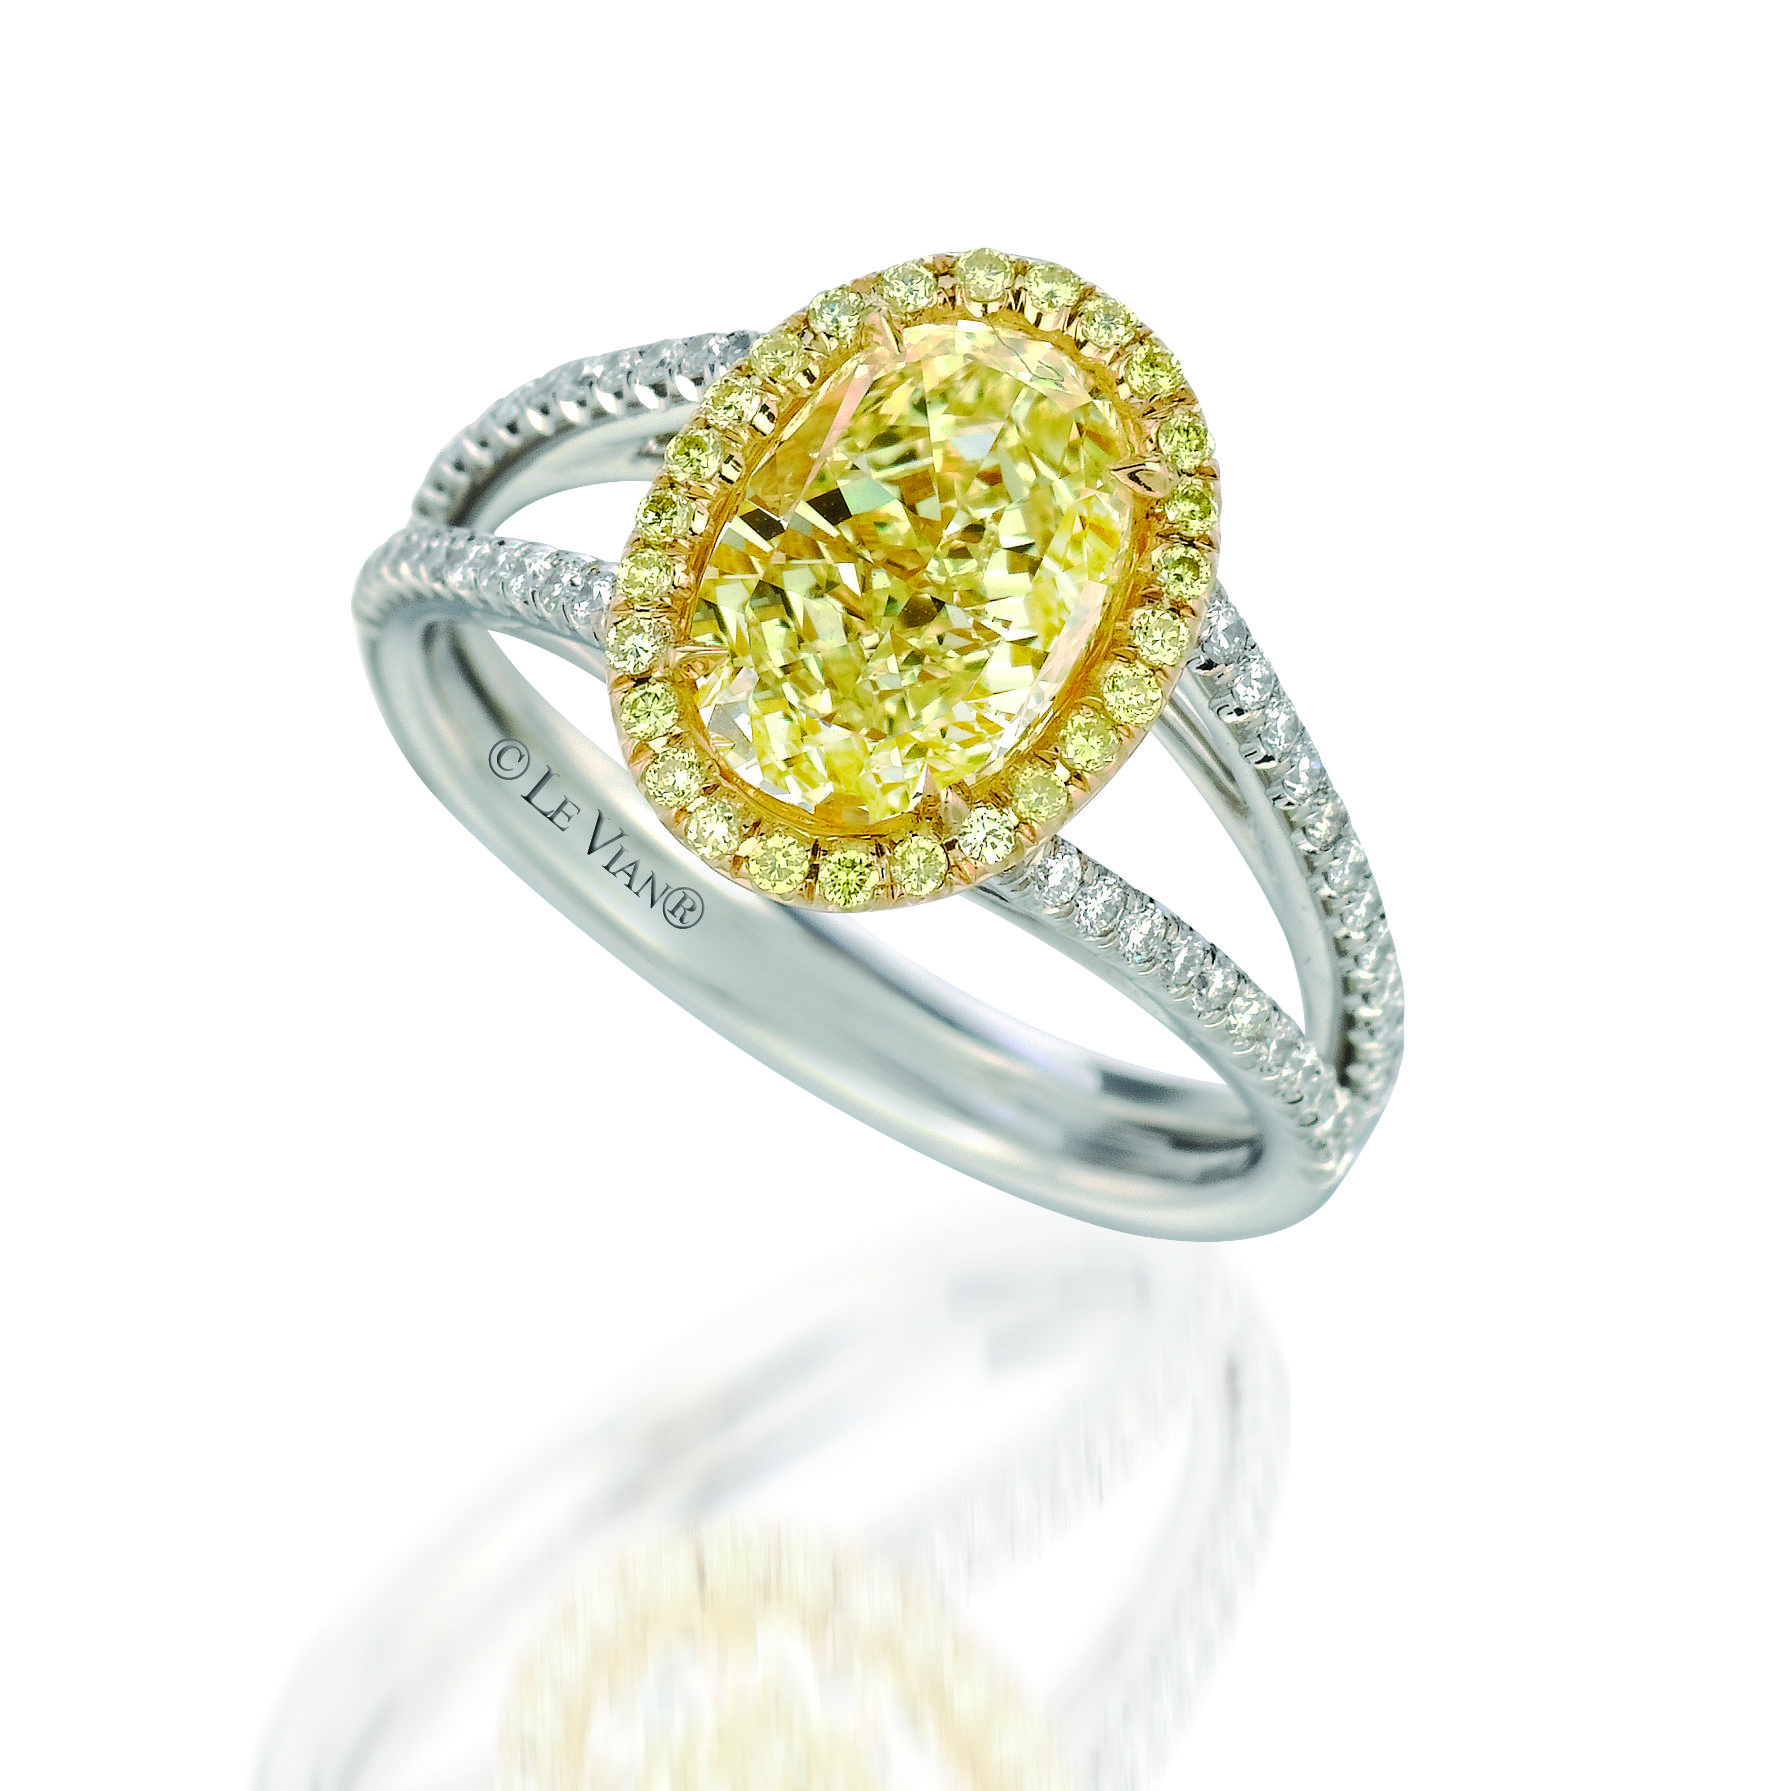 d1d4d1989 Le Vian's Sunny Yellow Diamonds™ Ring   Diamonds are a Girl's Best ...